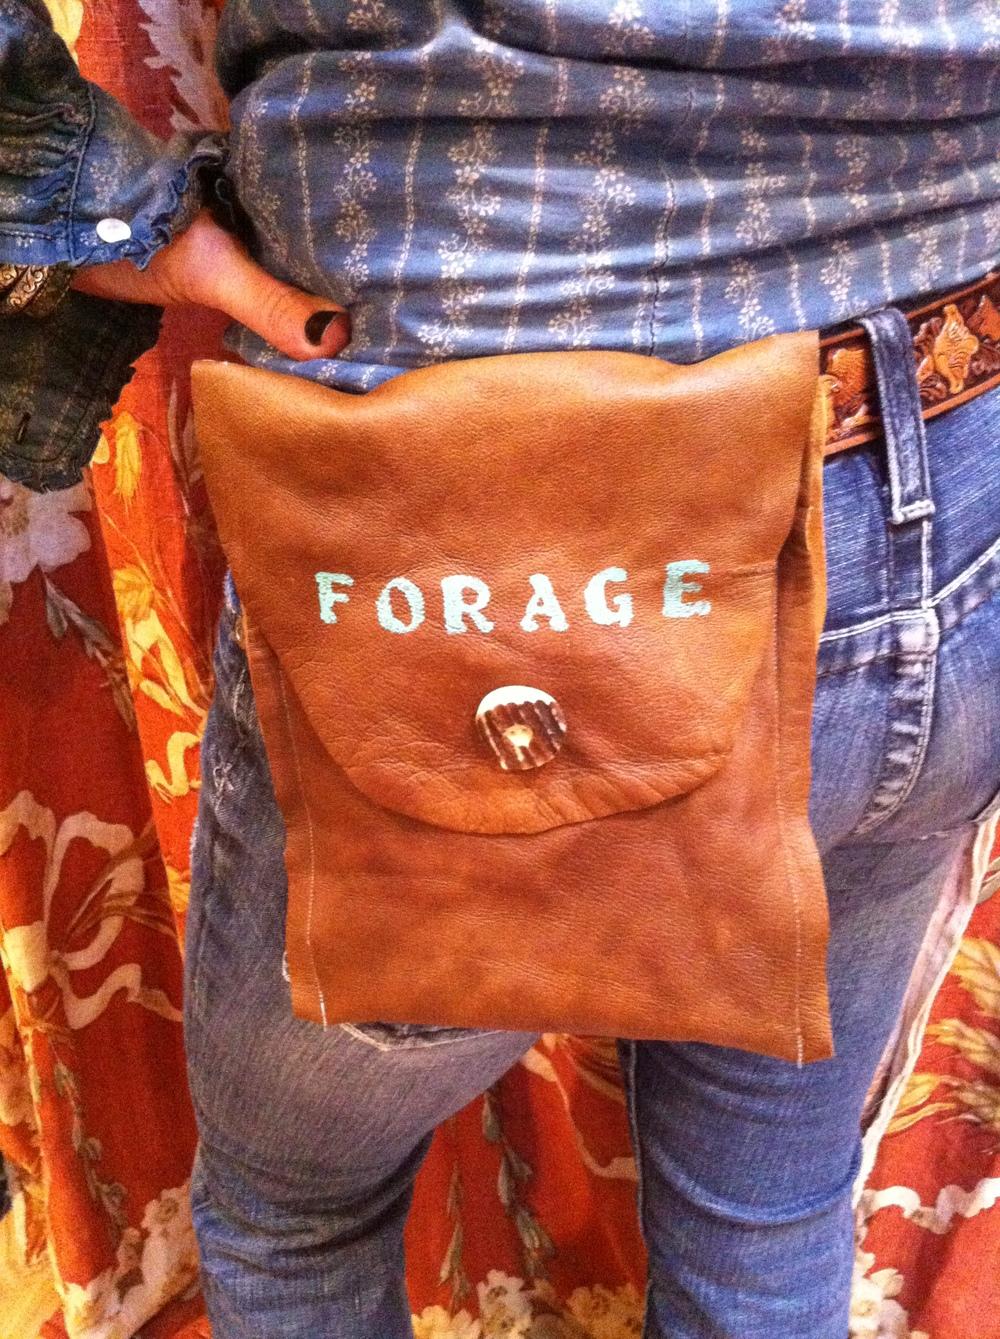 forage 5.JPG